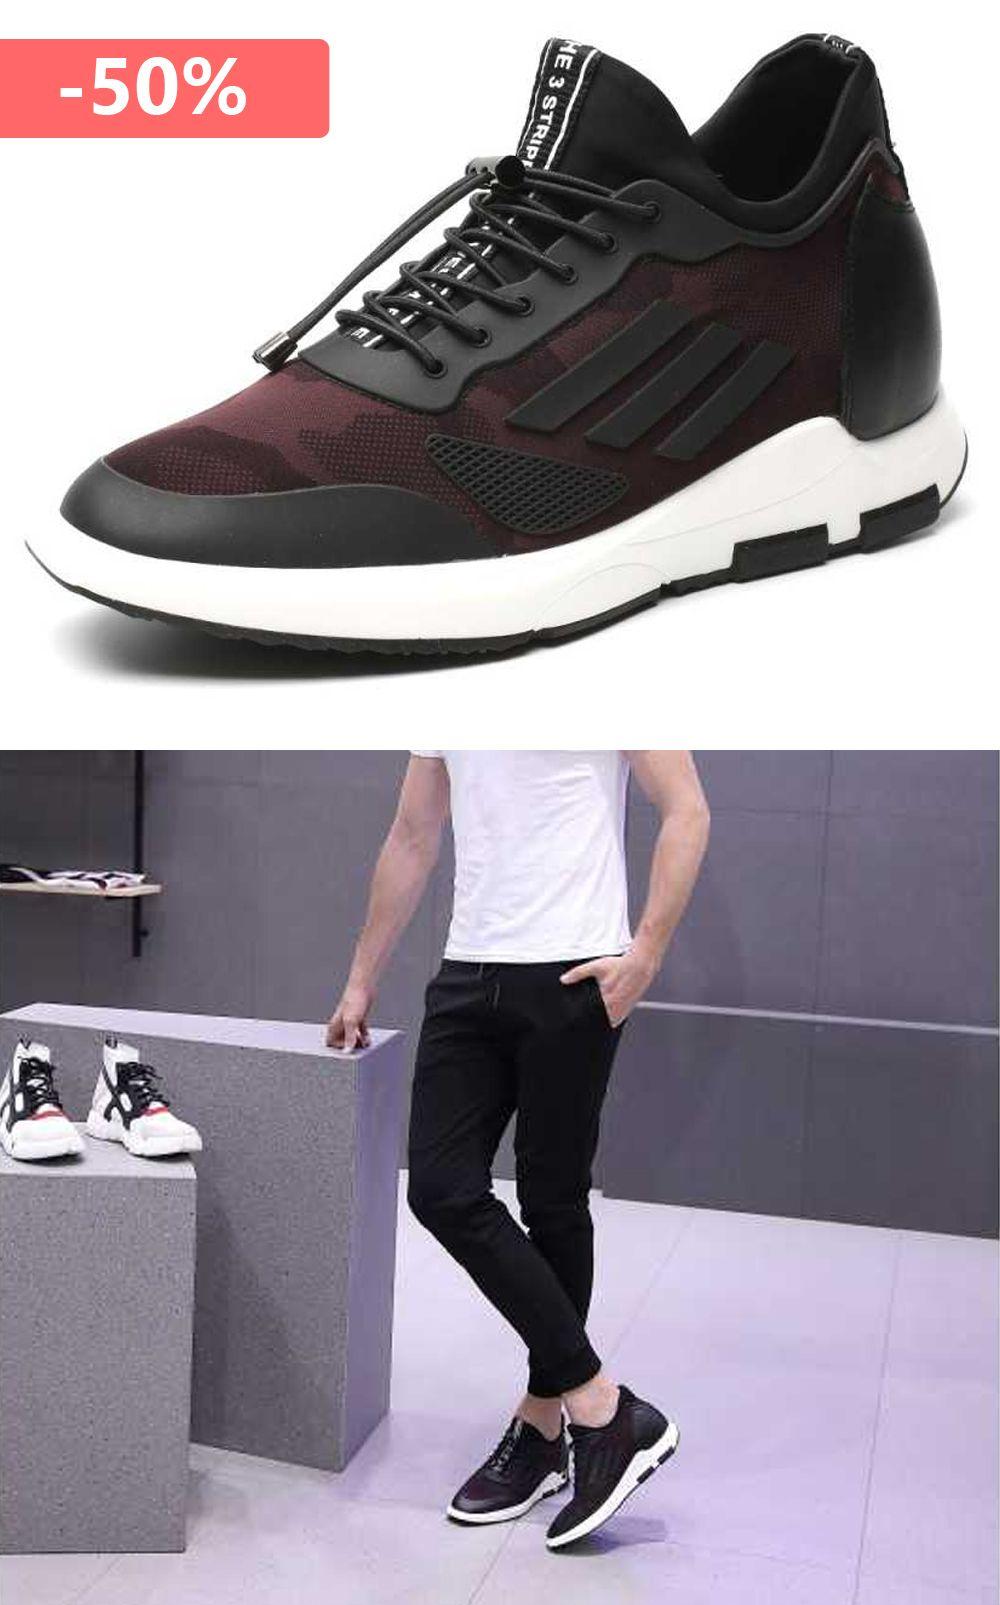 Meskie Recznie Wykonane Buty Podwyzszajace Sportowo Codzienne 7cm Faretti Agaton Carlo High Top Sneakers Sneakers Top Sneakers